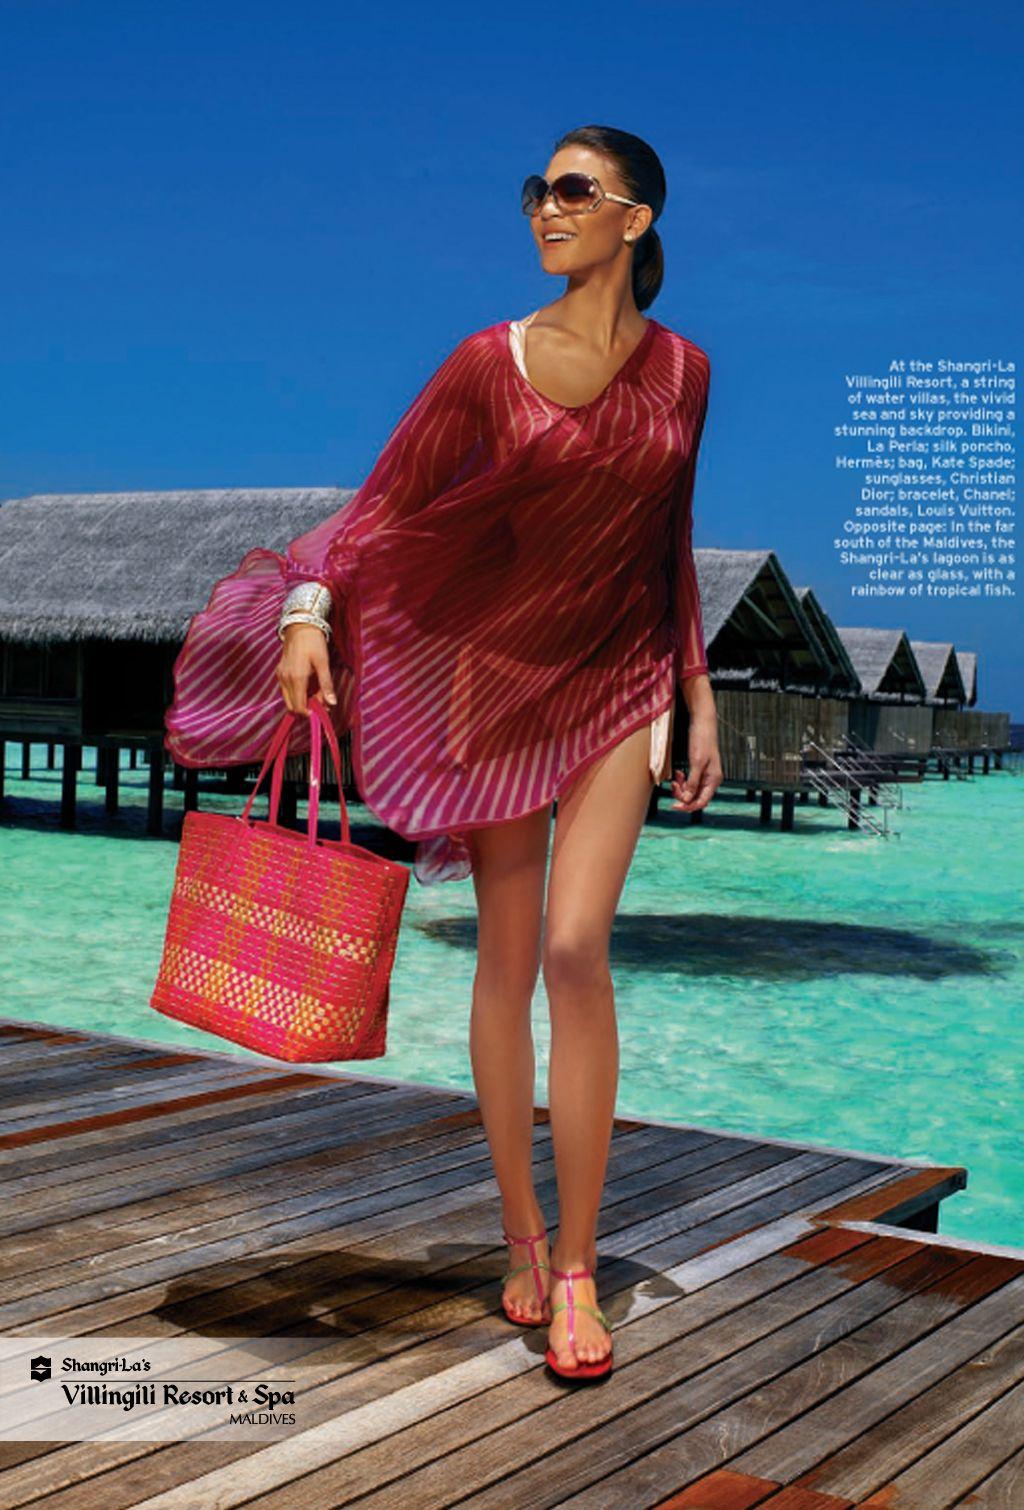 99141eb44c Fashion - Shangri-La's Villingili Resort and Spa, Maldives  #shangrilamaldives